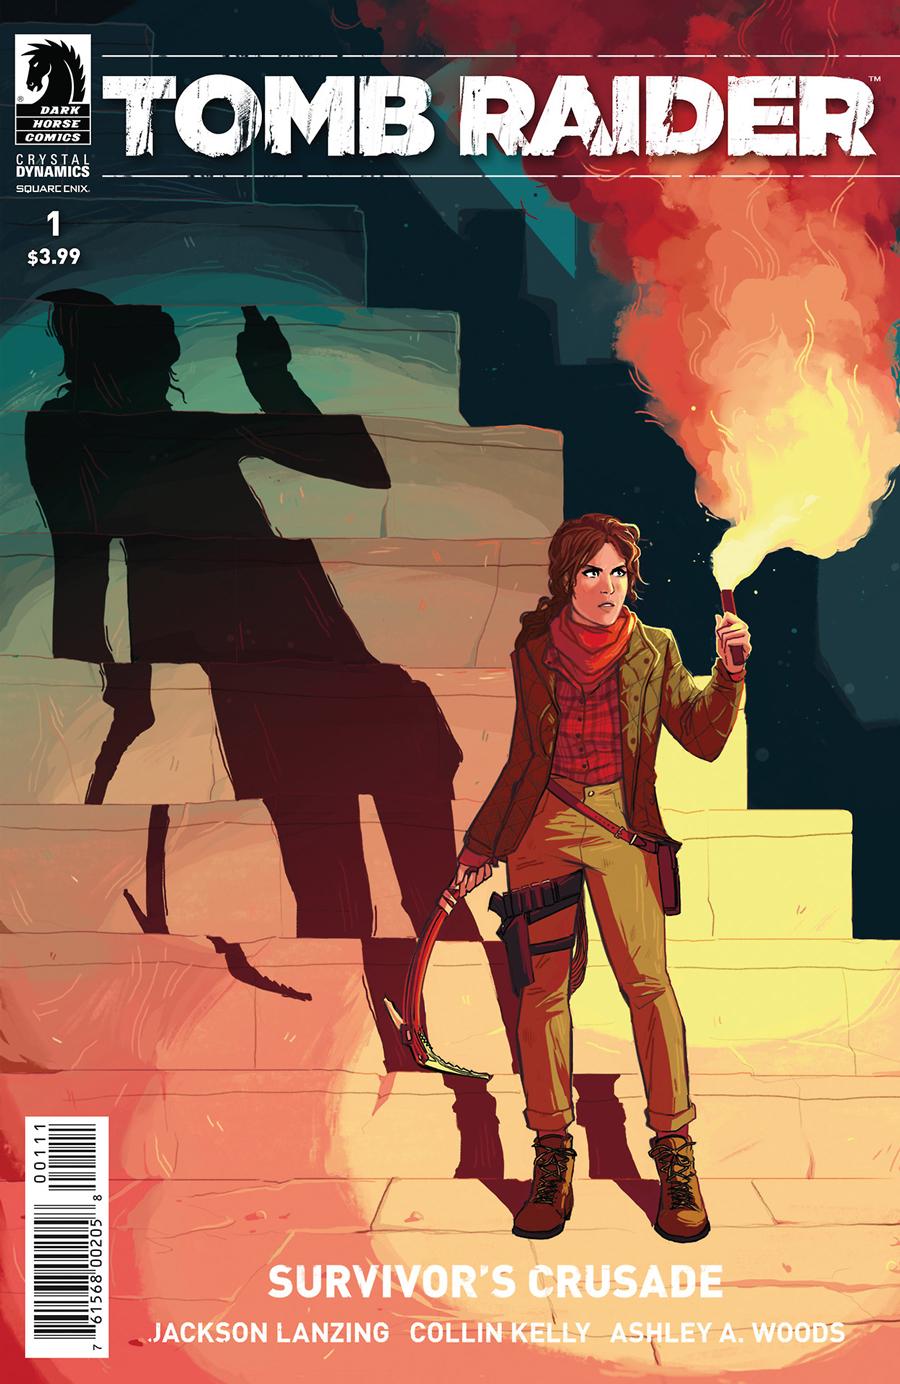 Tomb Raider Survivor's Crusade - Cover